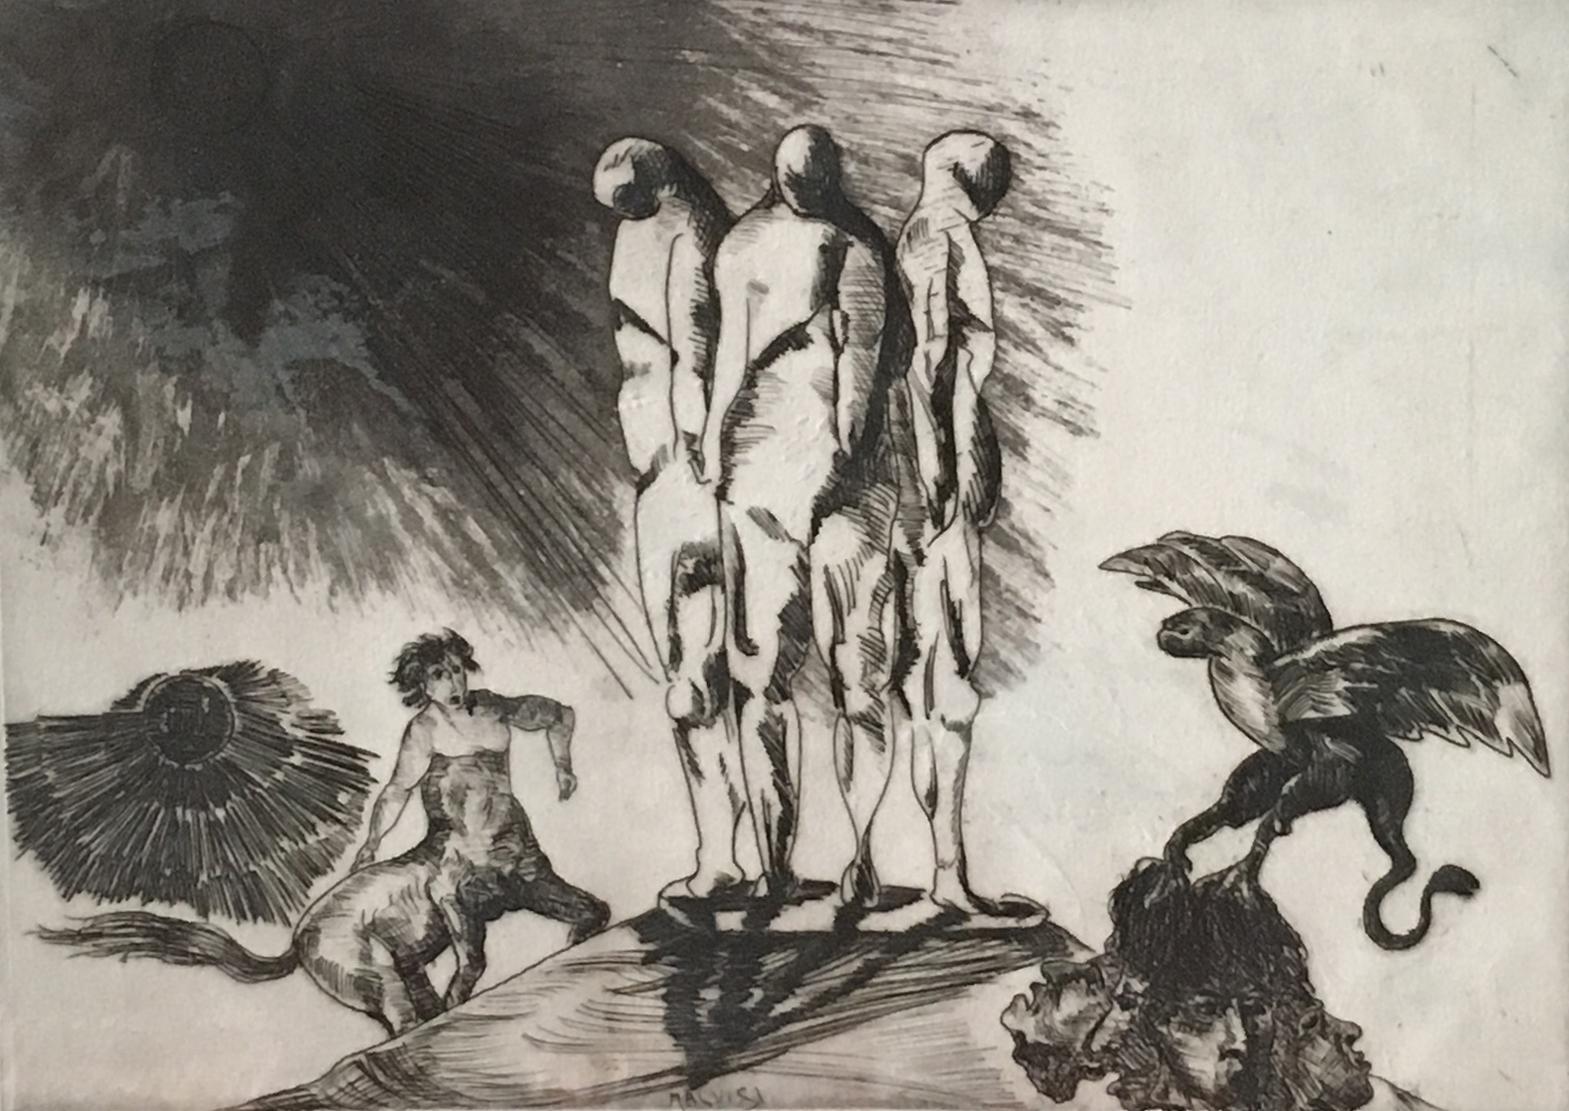 <b>Defenseless</b><br> (Orig.Senza difese) <br> 1988 Etching <br> cm 60 x 38